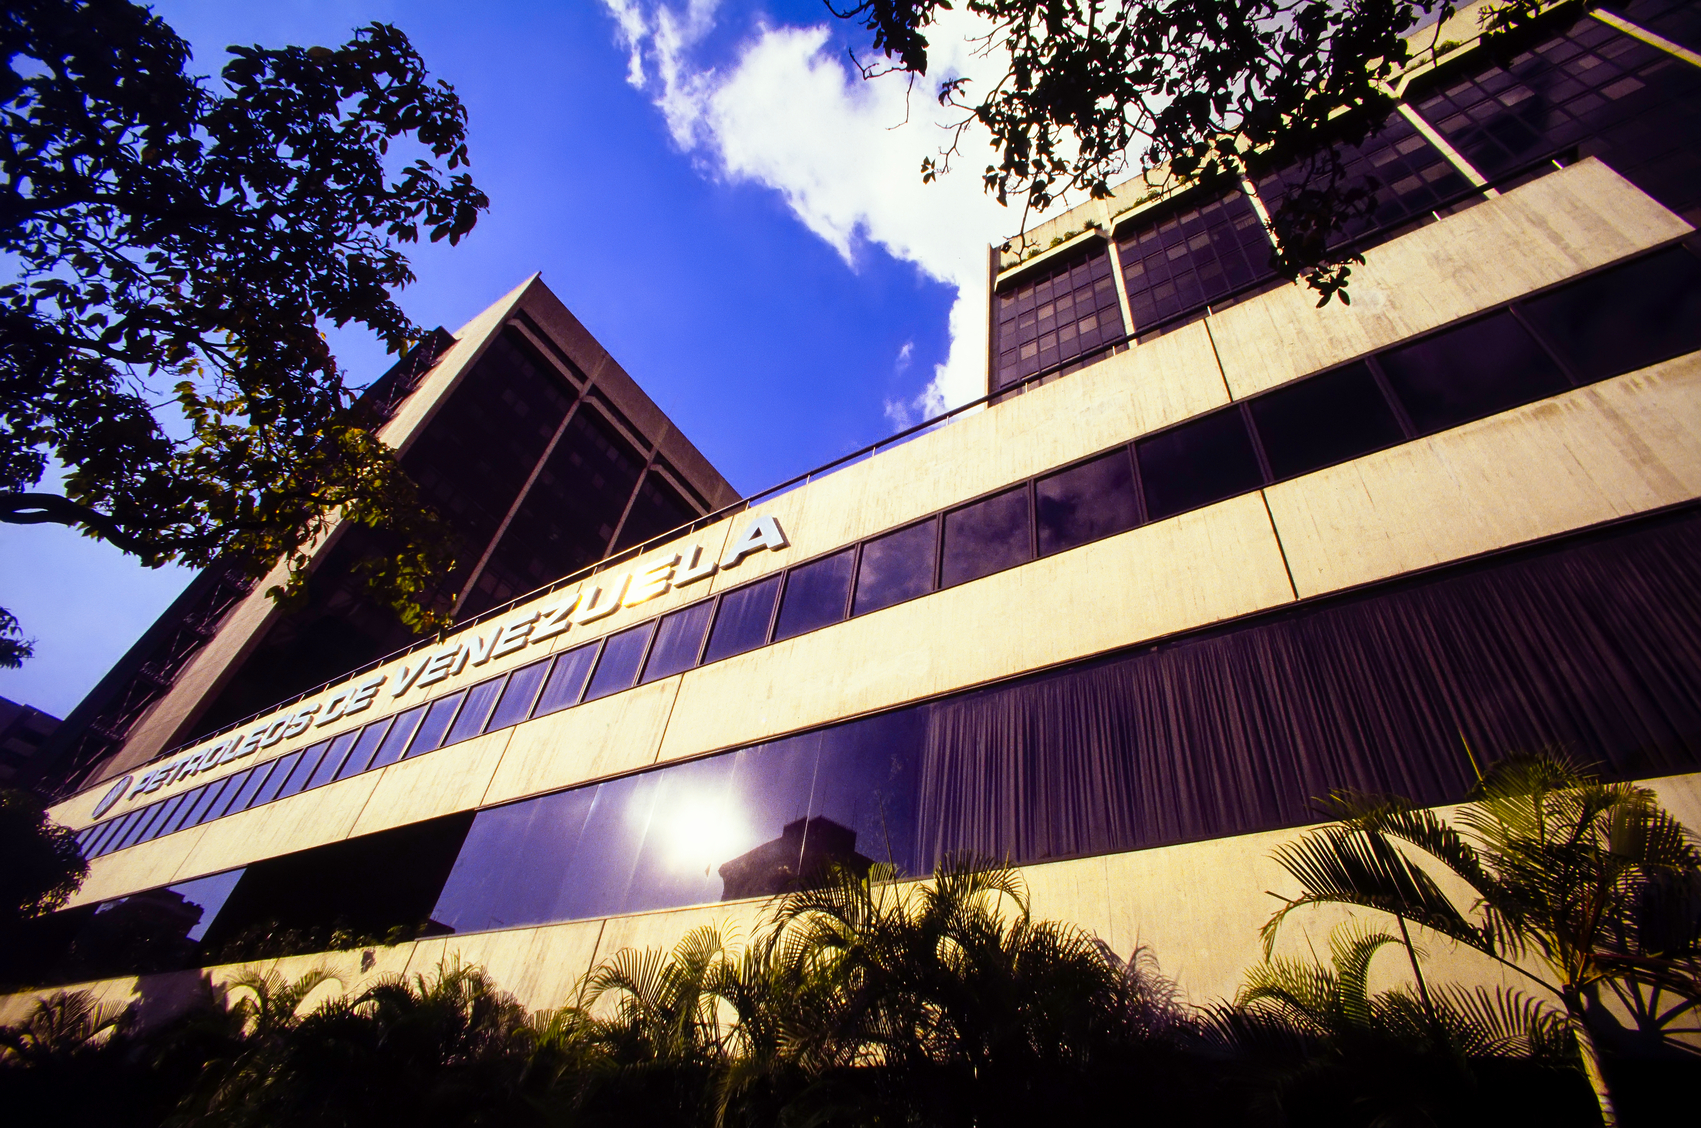 FCPA Docket: DOJ seizing assets in second PDVSA corruption case